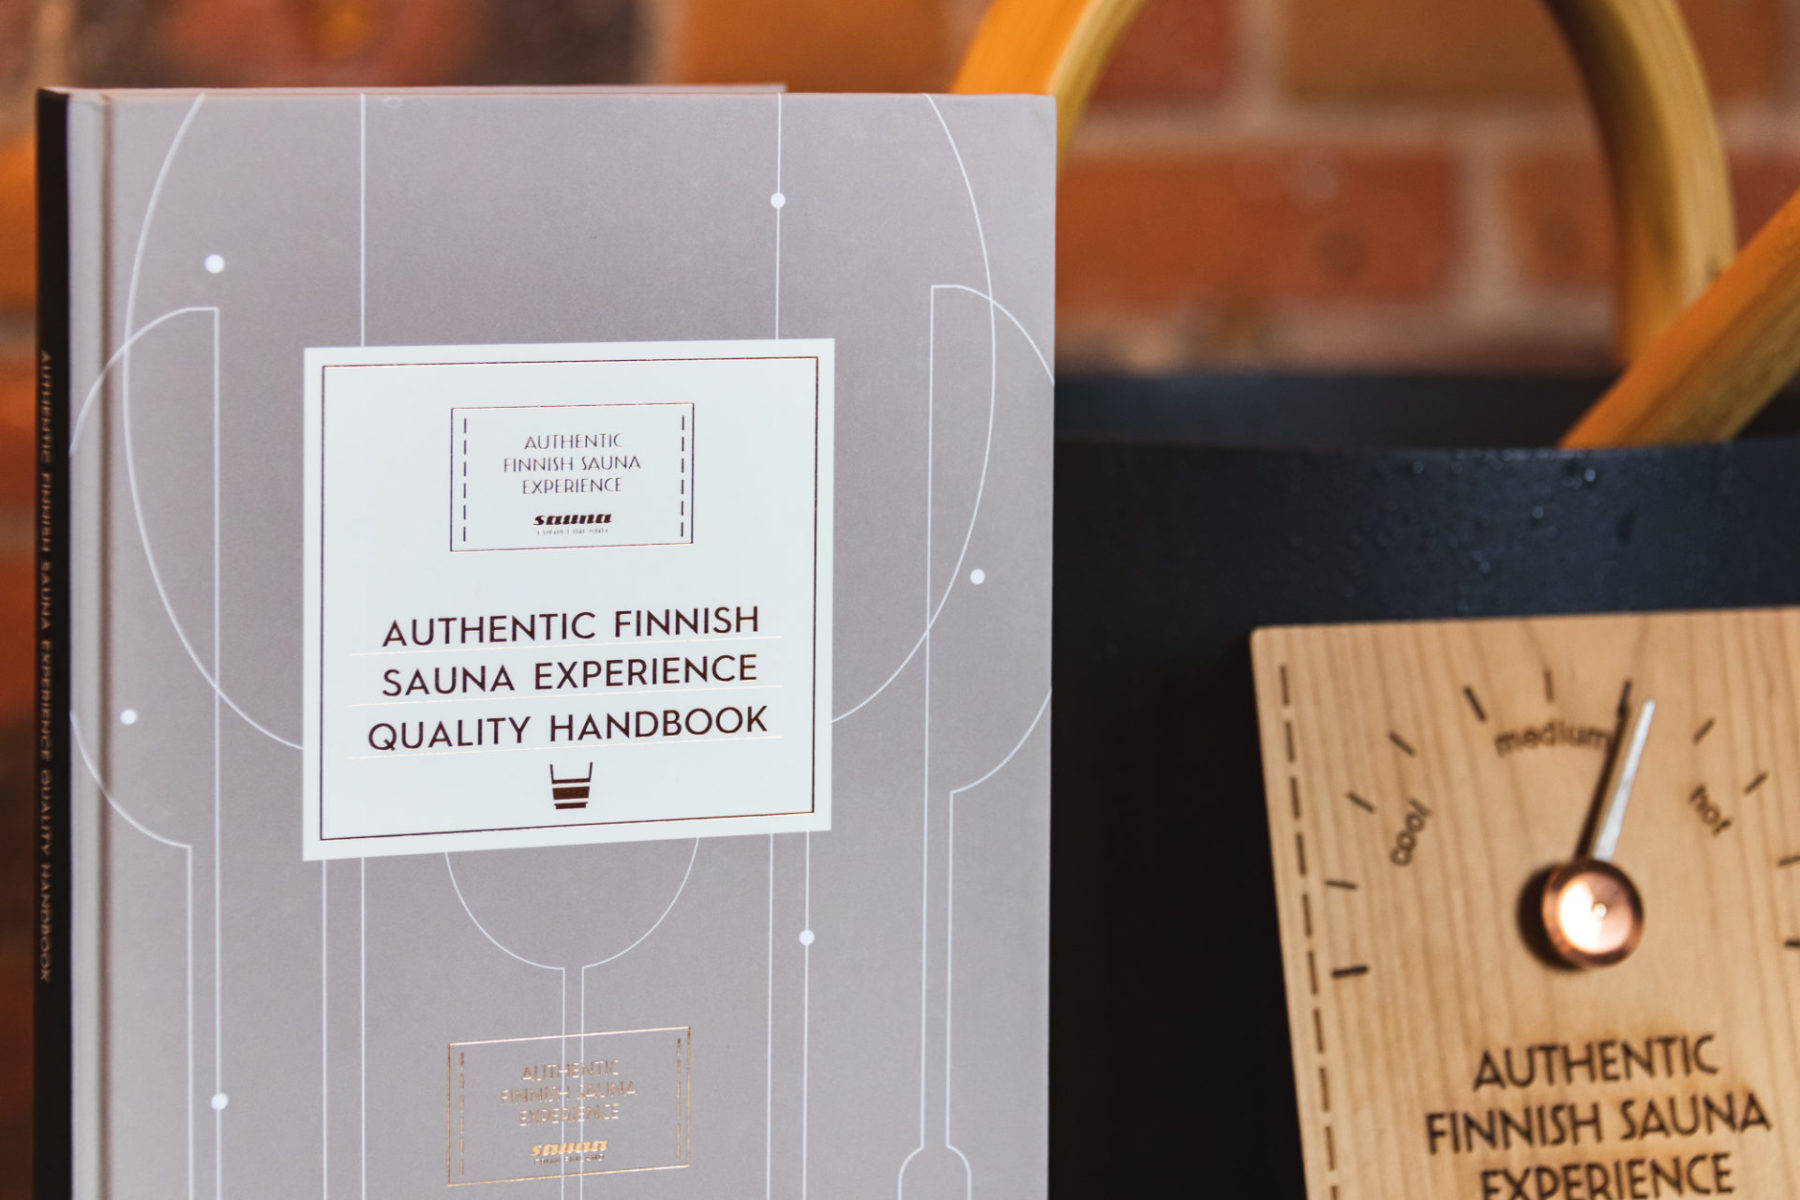 Authentic Finnish Sauna Experience Quality Handbook